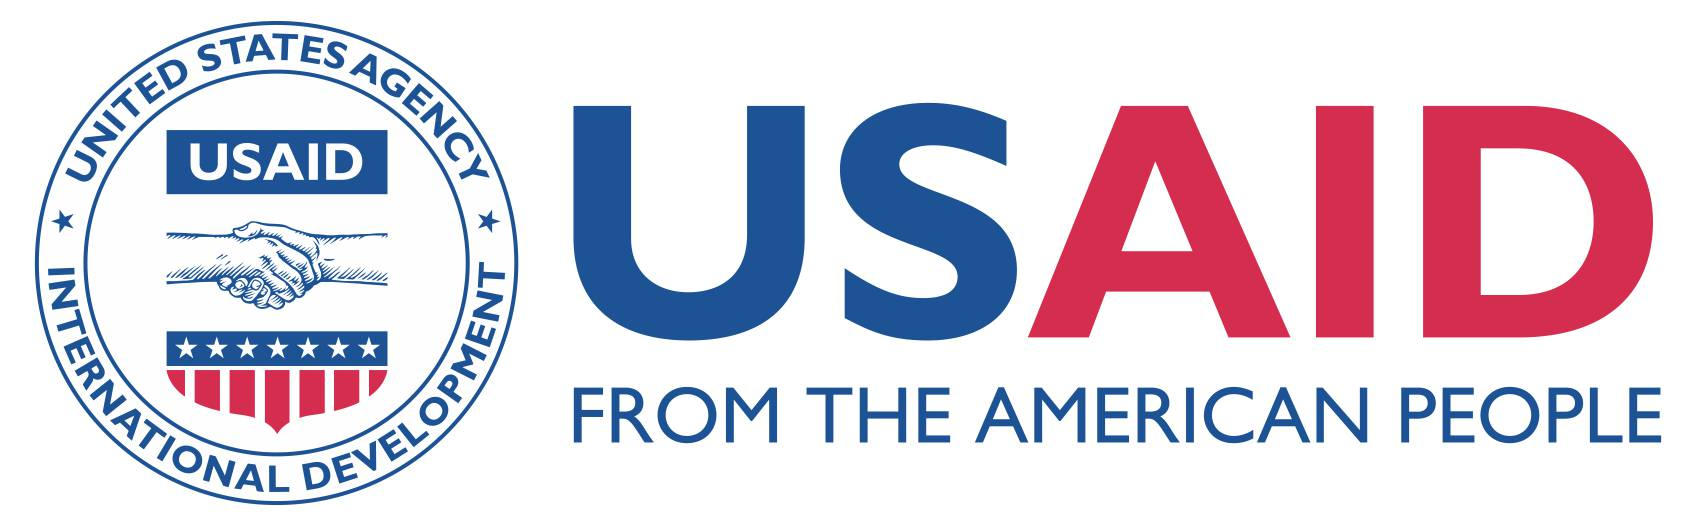 USAID New Logo.jpg